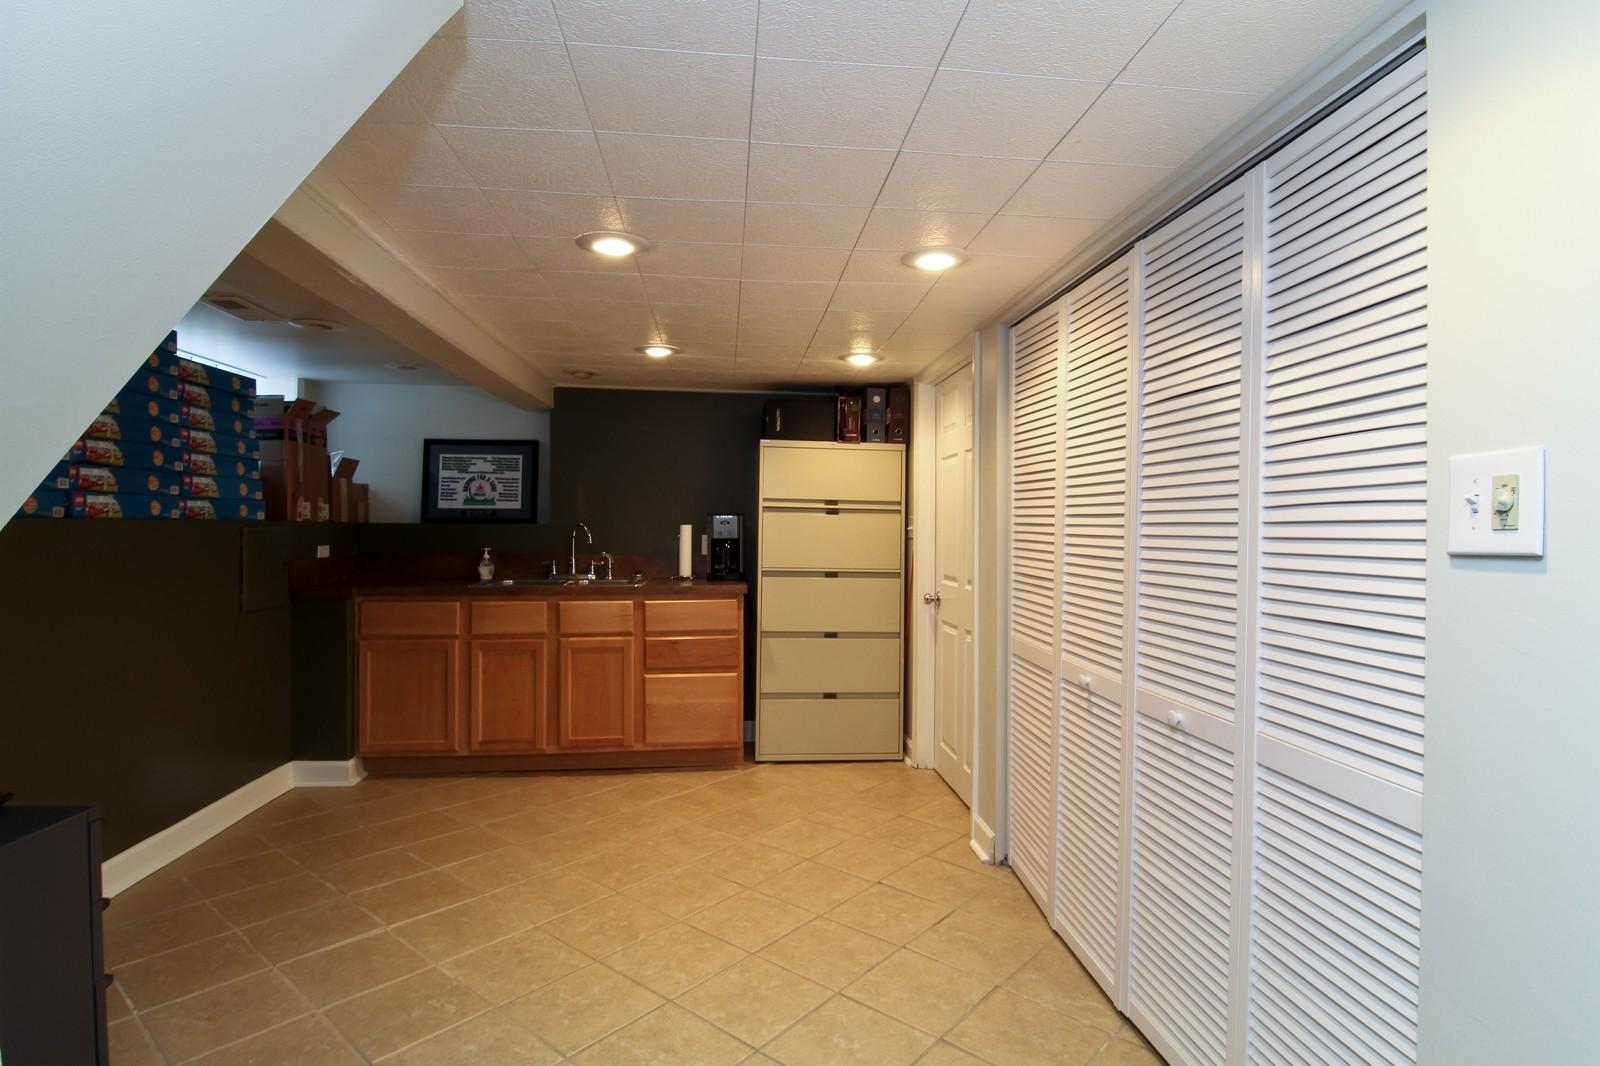 Real Estate Photography - 310 S Hale St, Wheaton, IL, 60187 - Location 8